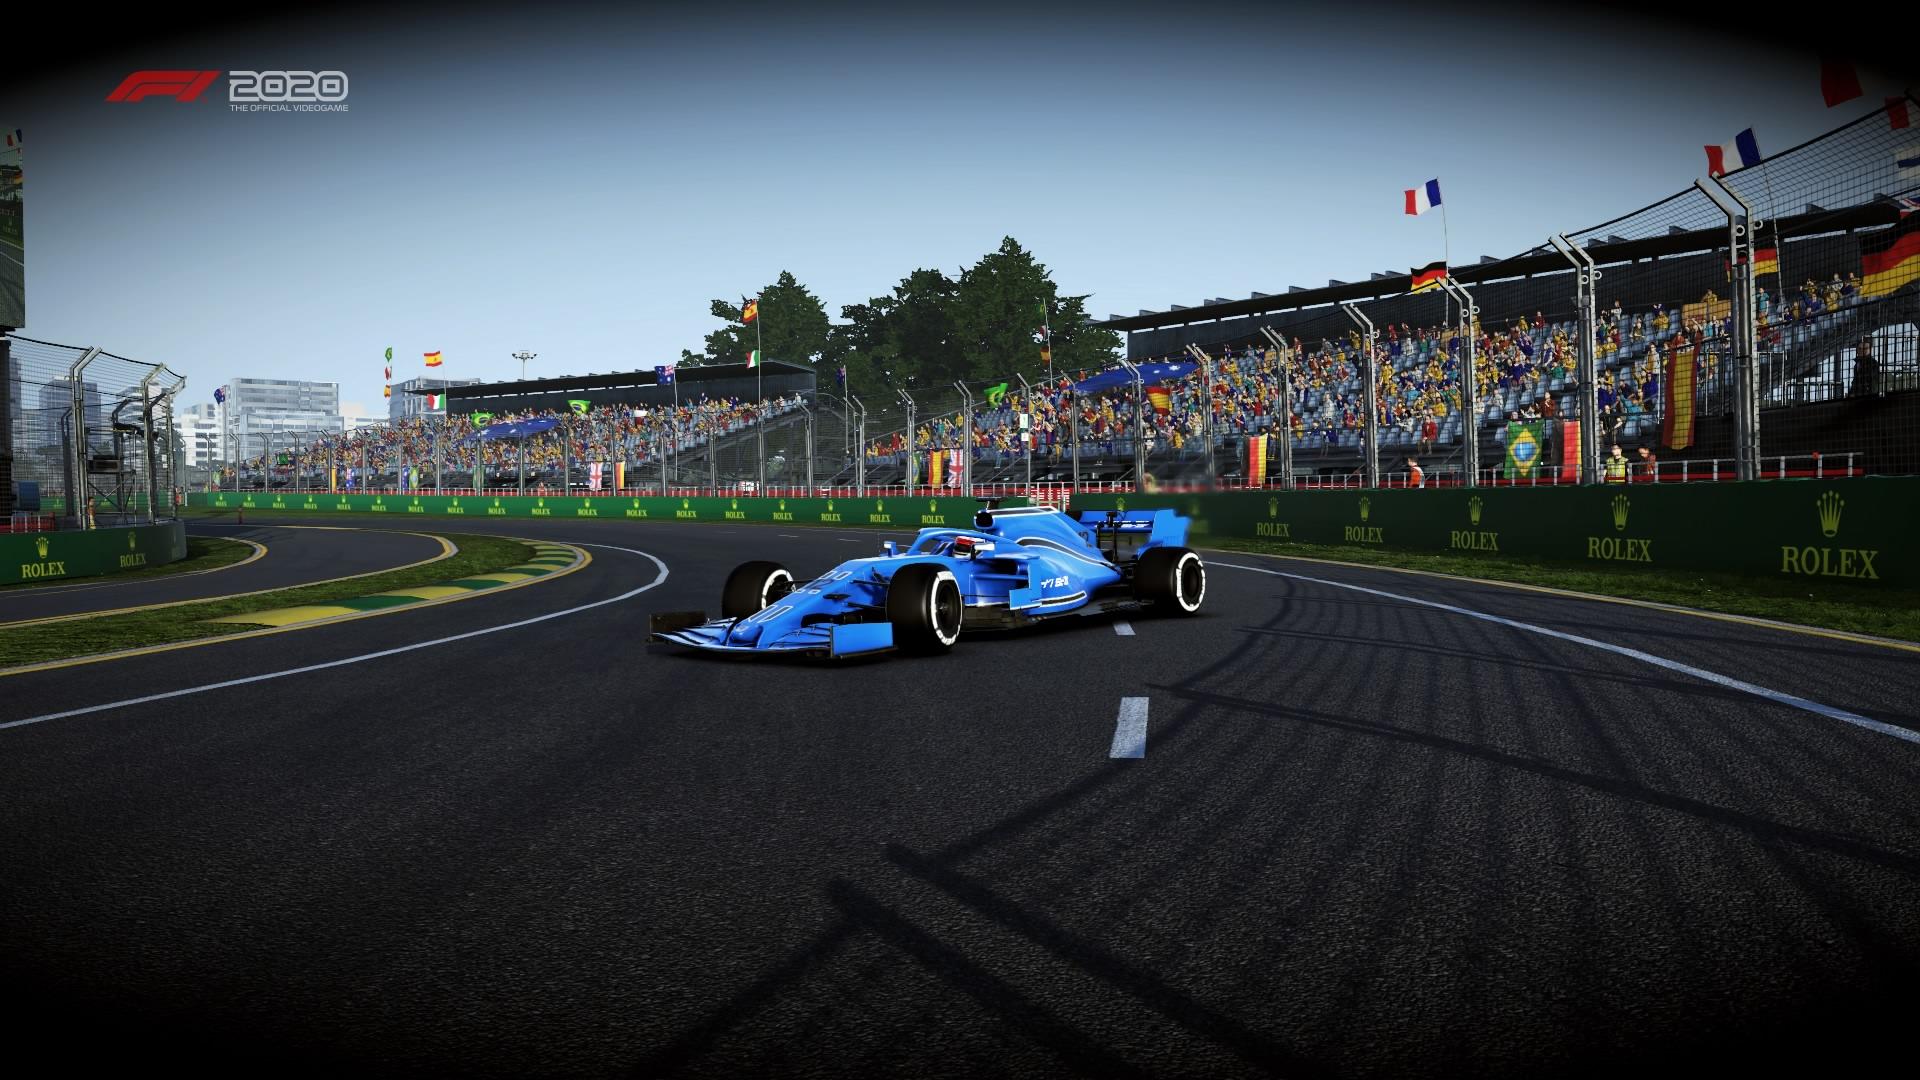 F1® 2020 Tech Princess Racing in Australia